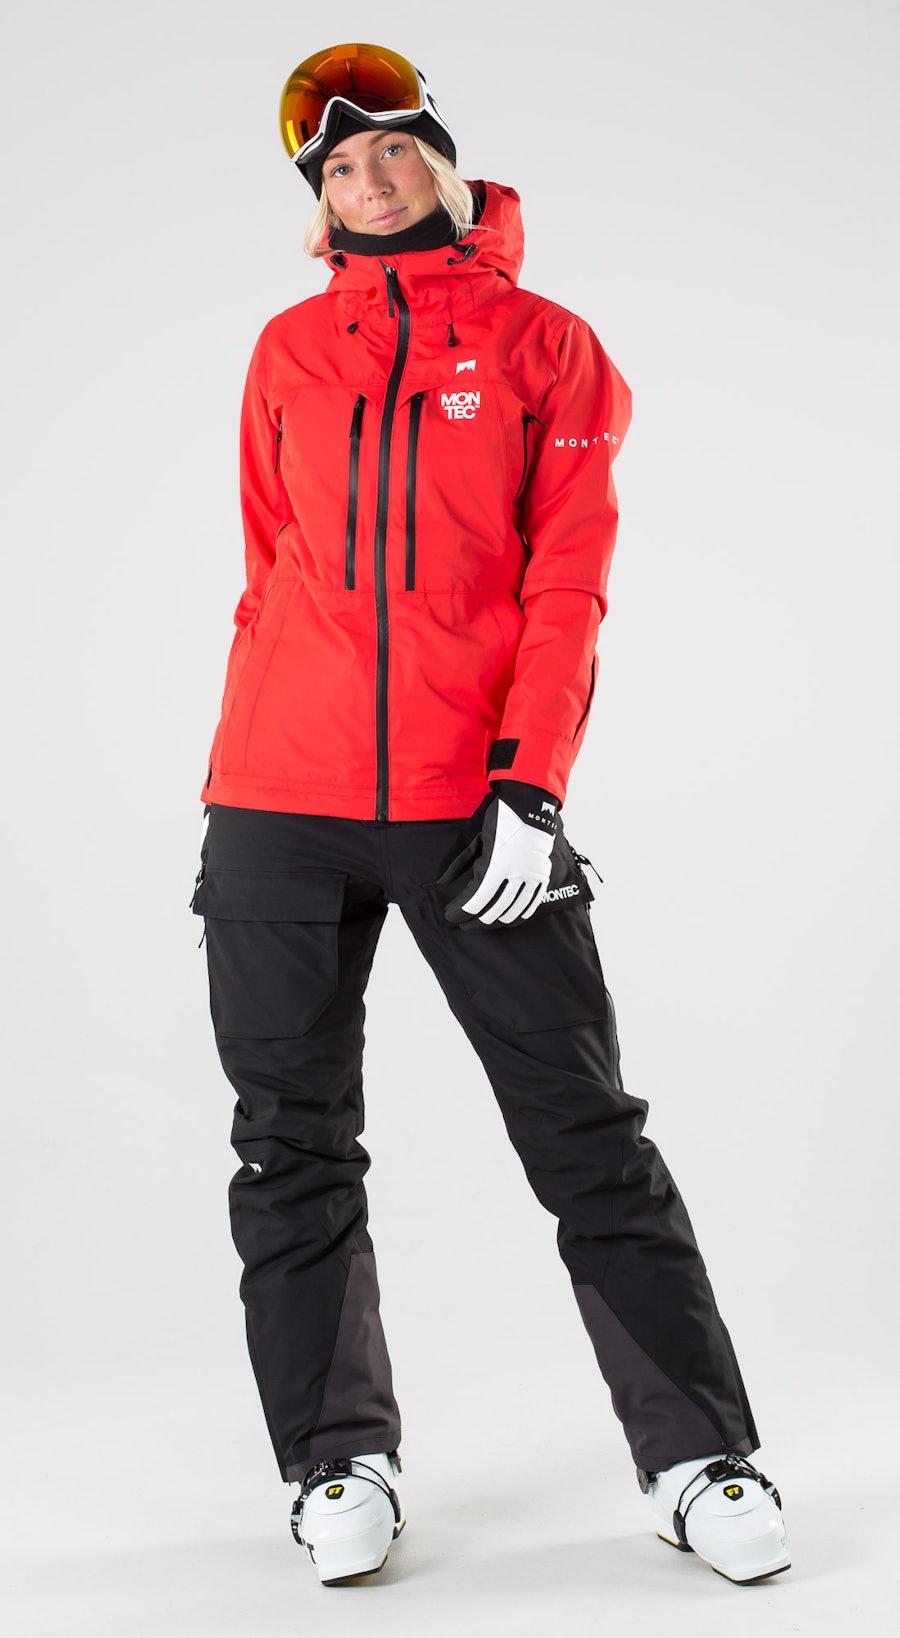 Montec Moss Red Ski clothing Multi